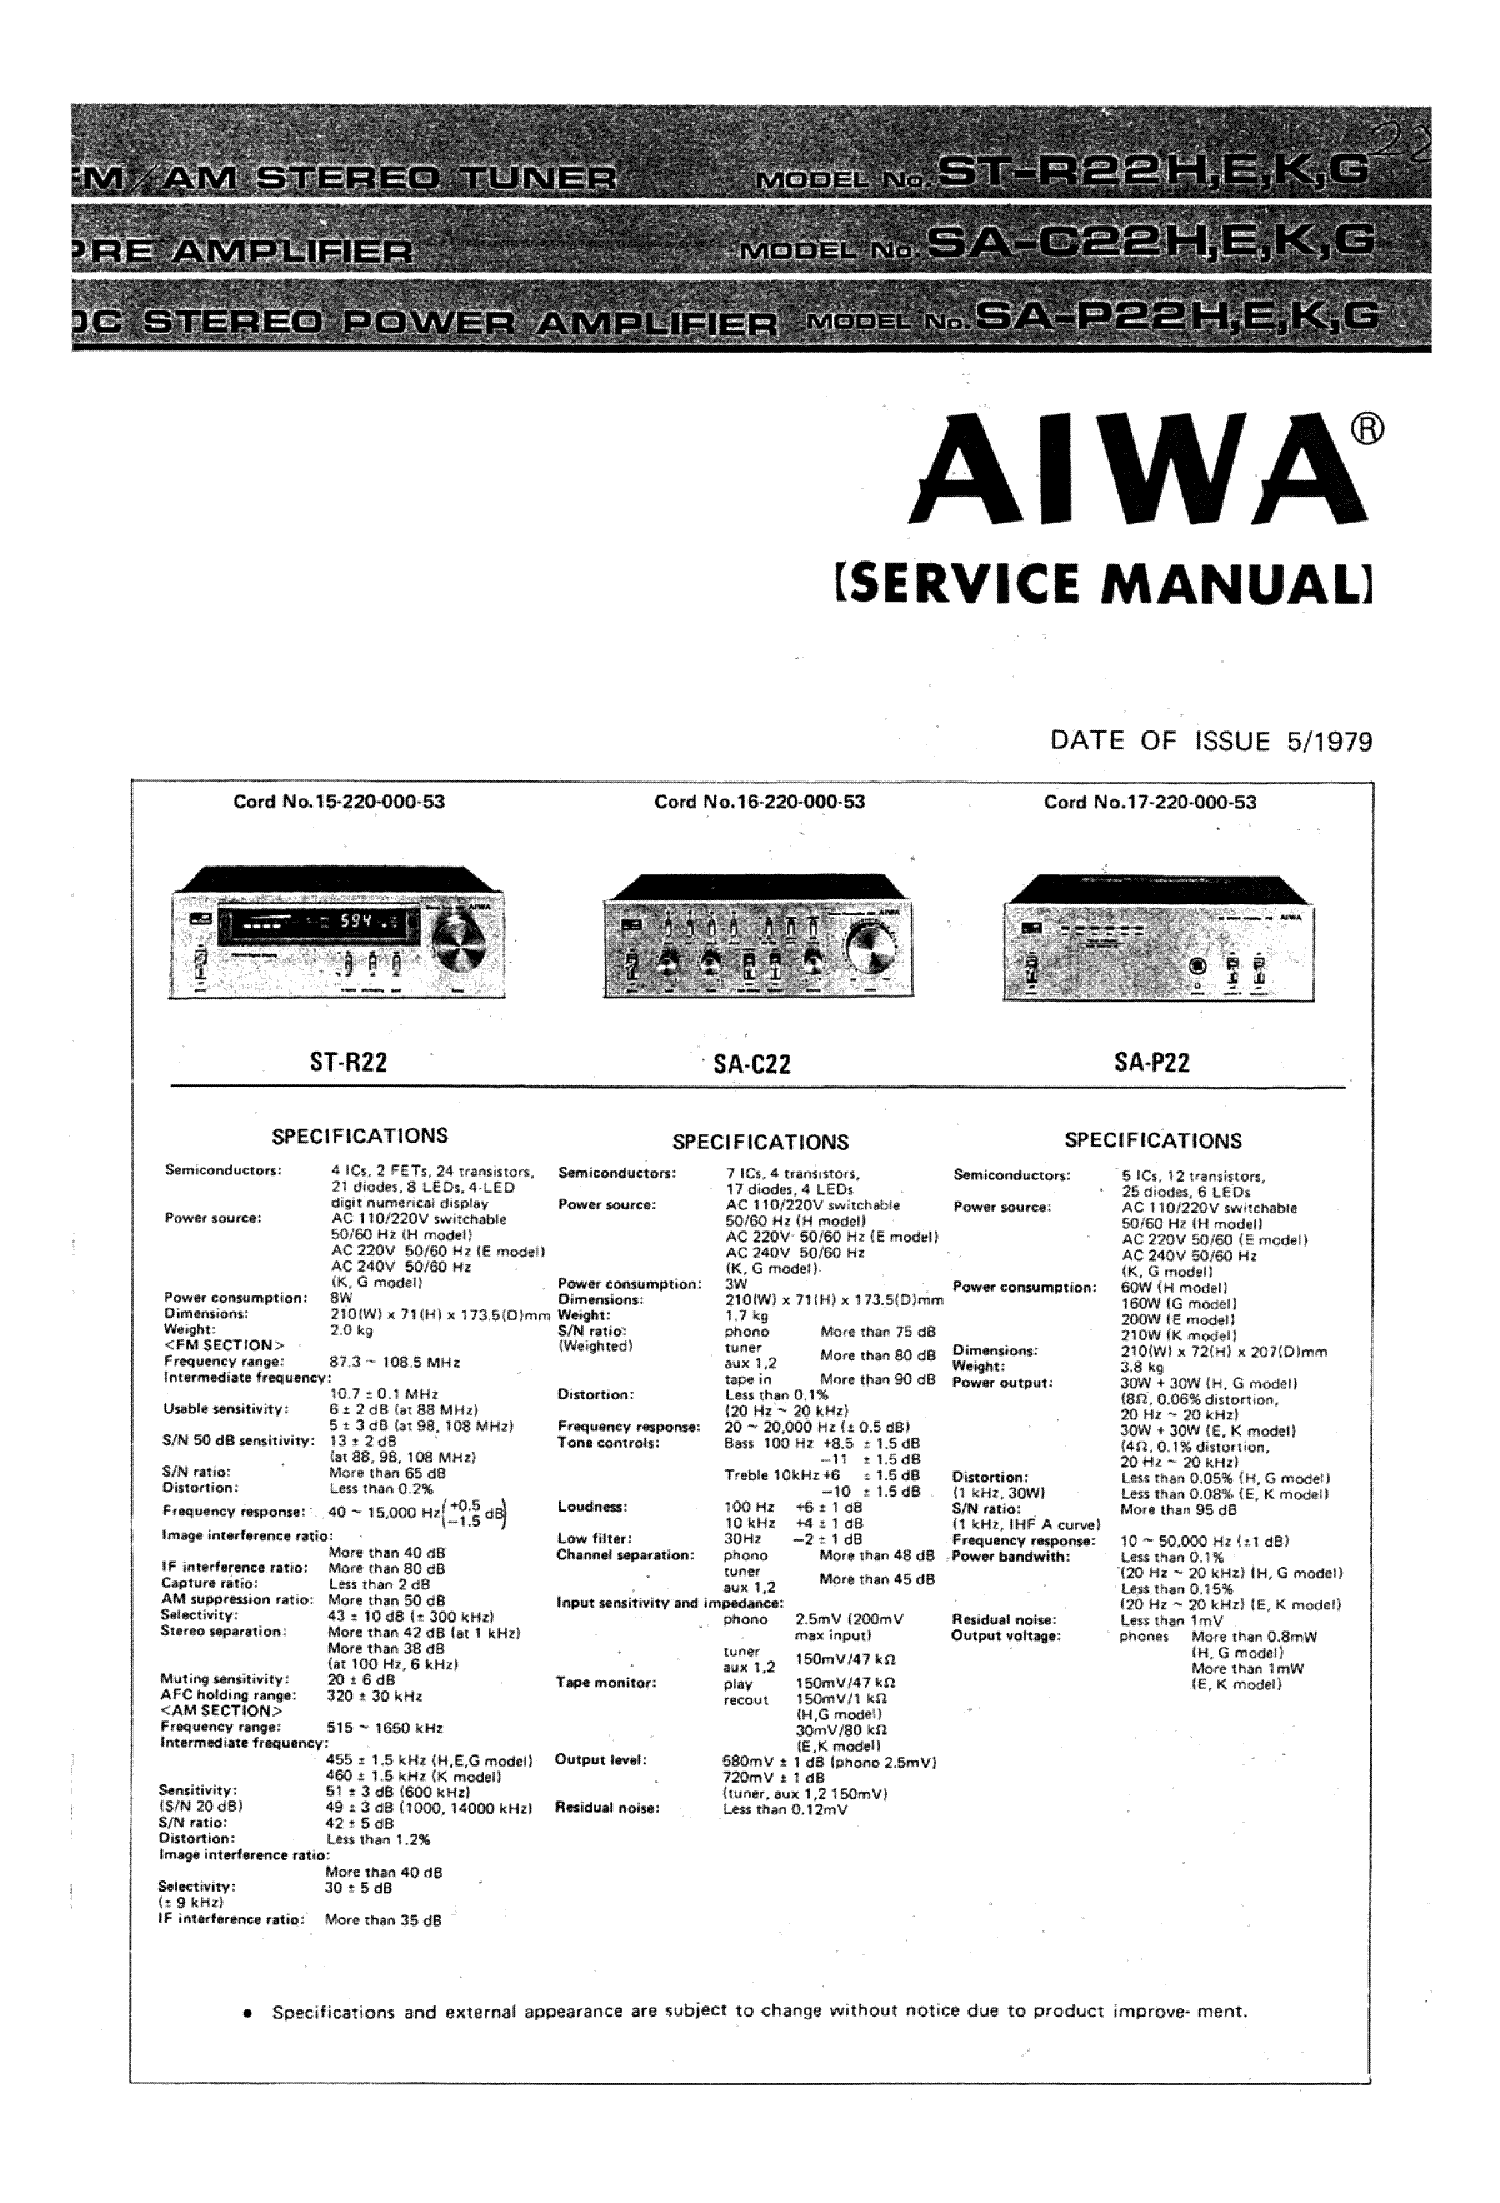 aiwa st r22 sa c22 sa p22 service manual download schematics rh elektrotanya com Aiwa Subwoofer Aiwa CD Player